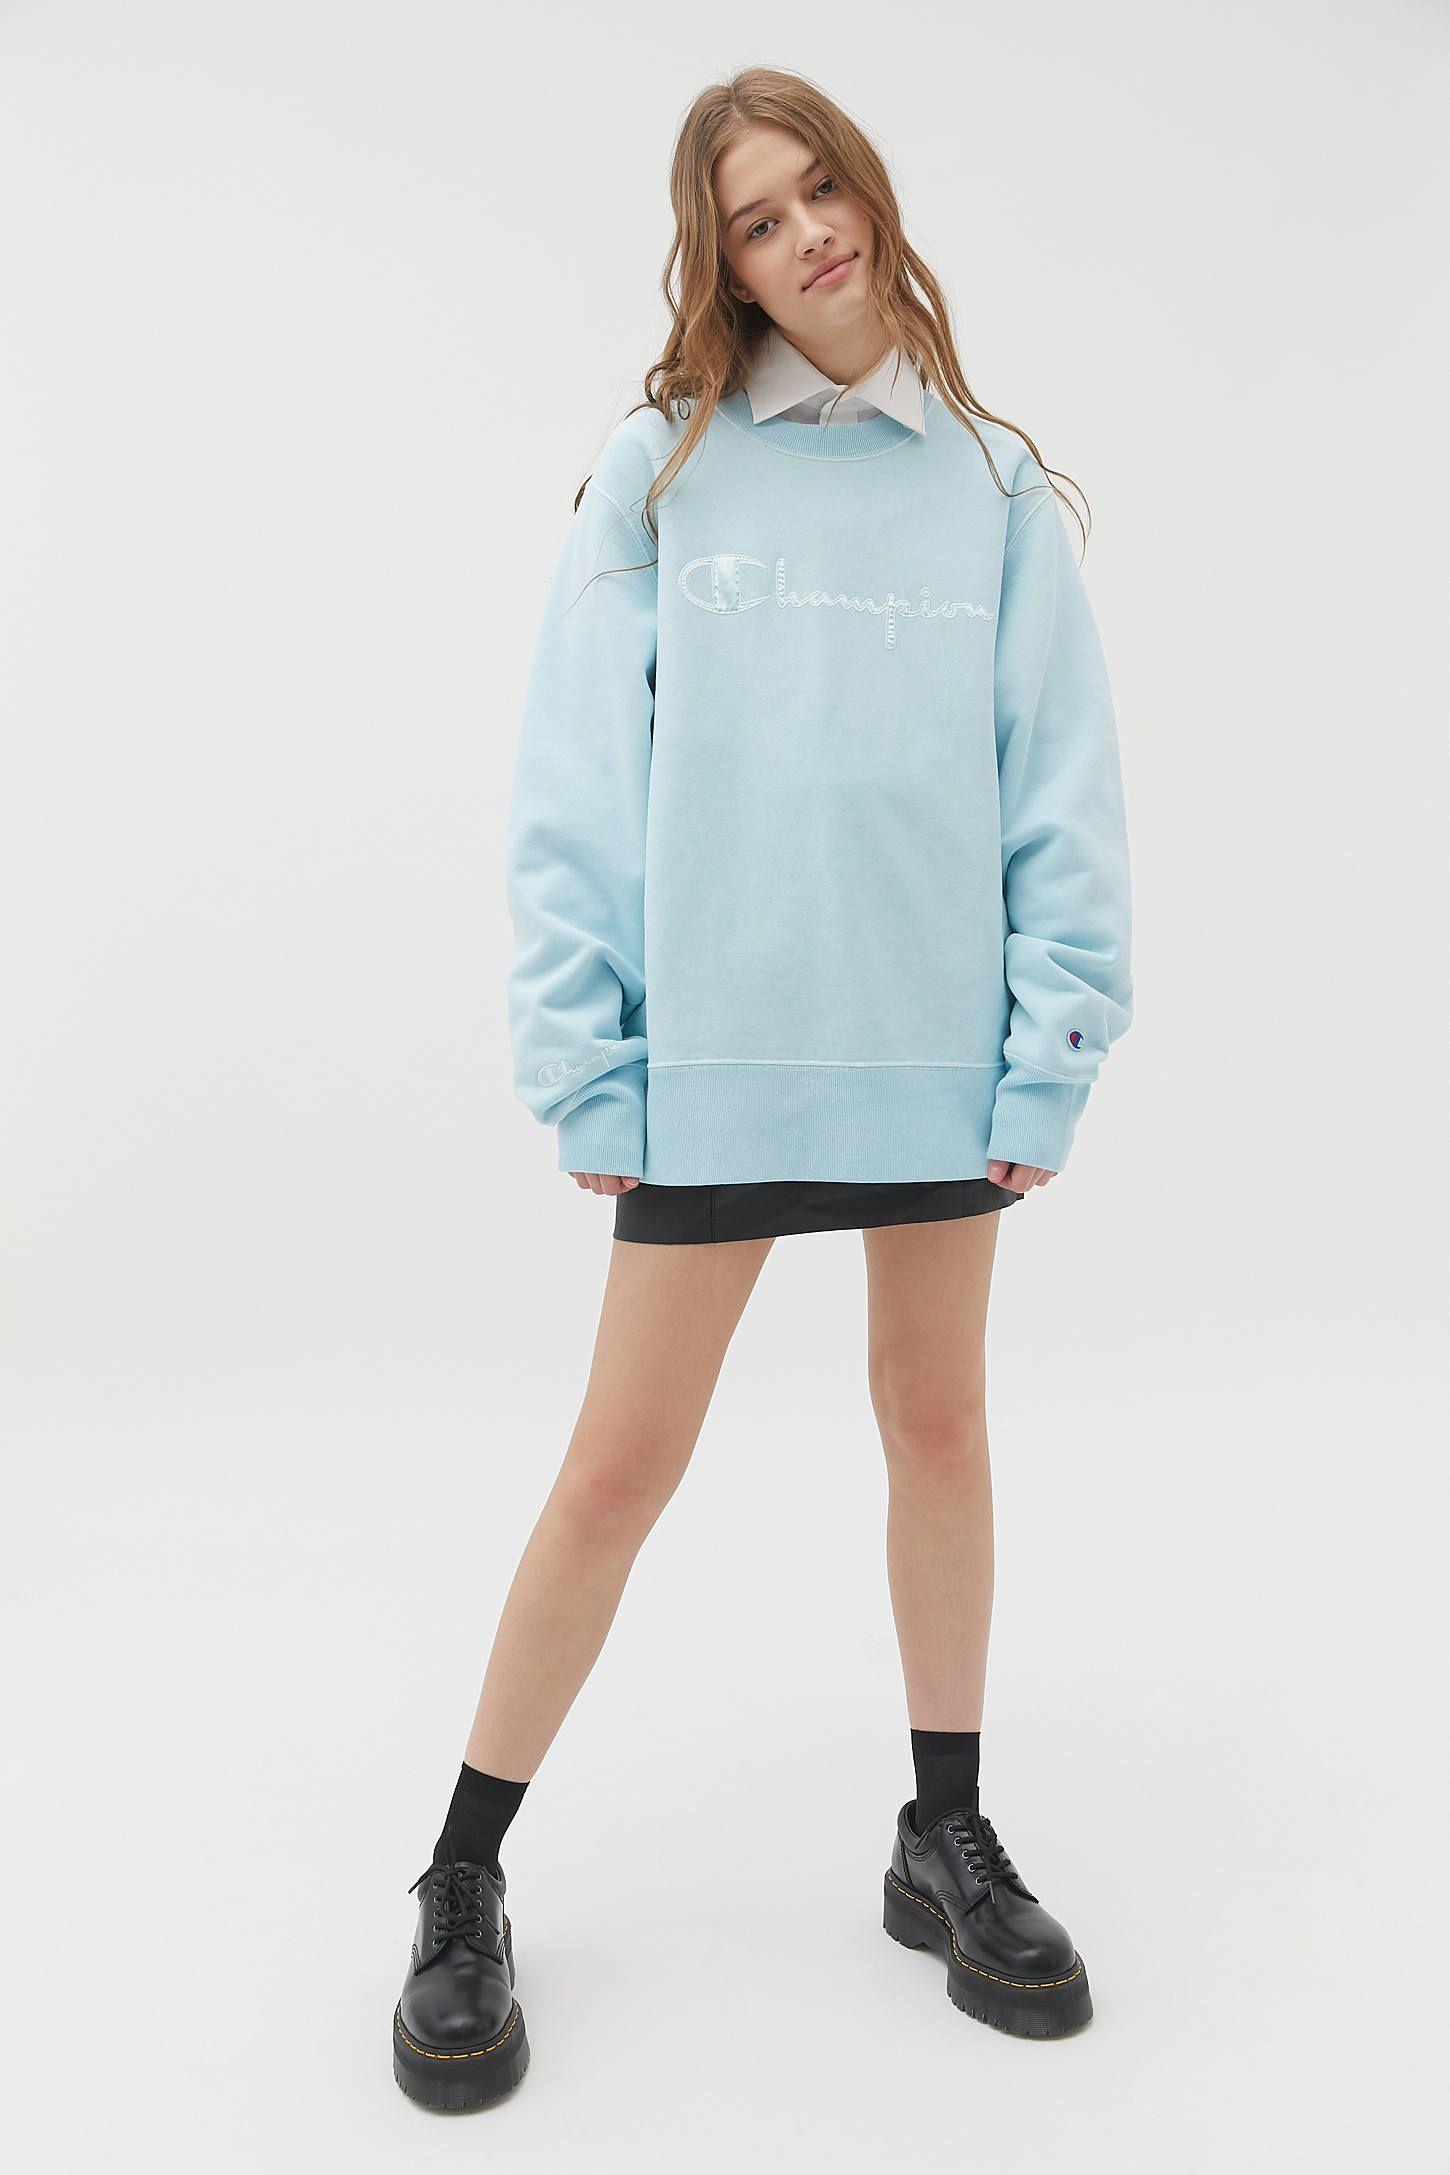 Champion Uo Exclusive Boyfriend Crew Neck Sweatshirt Crew Neck Sweatshirt Champion Pullover Basic Long Sleeve Tee [ 2175 x 1450 Pixel ]